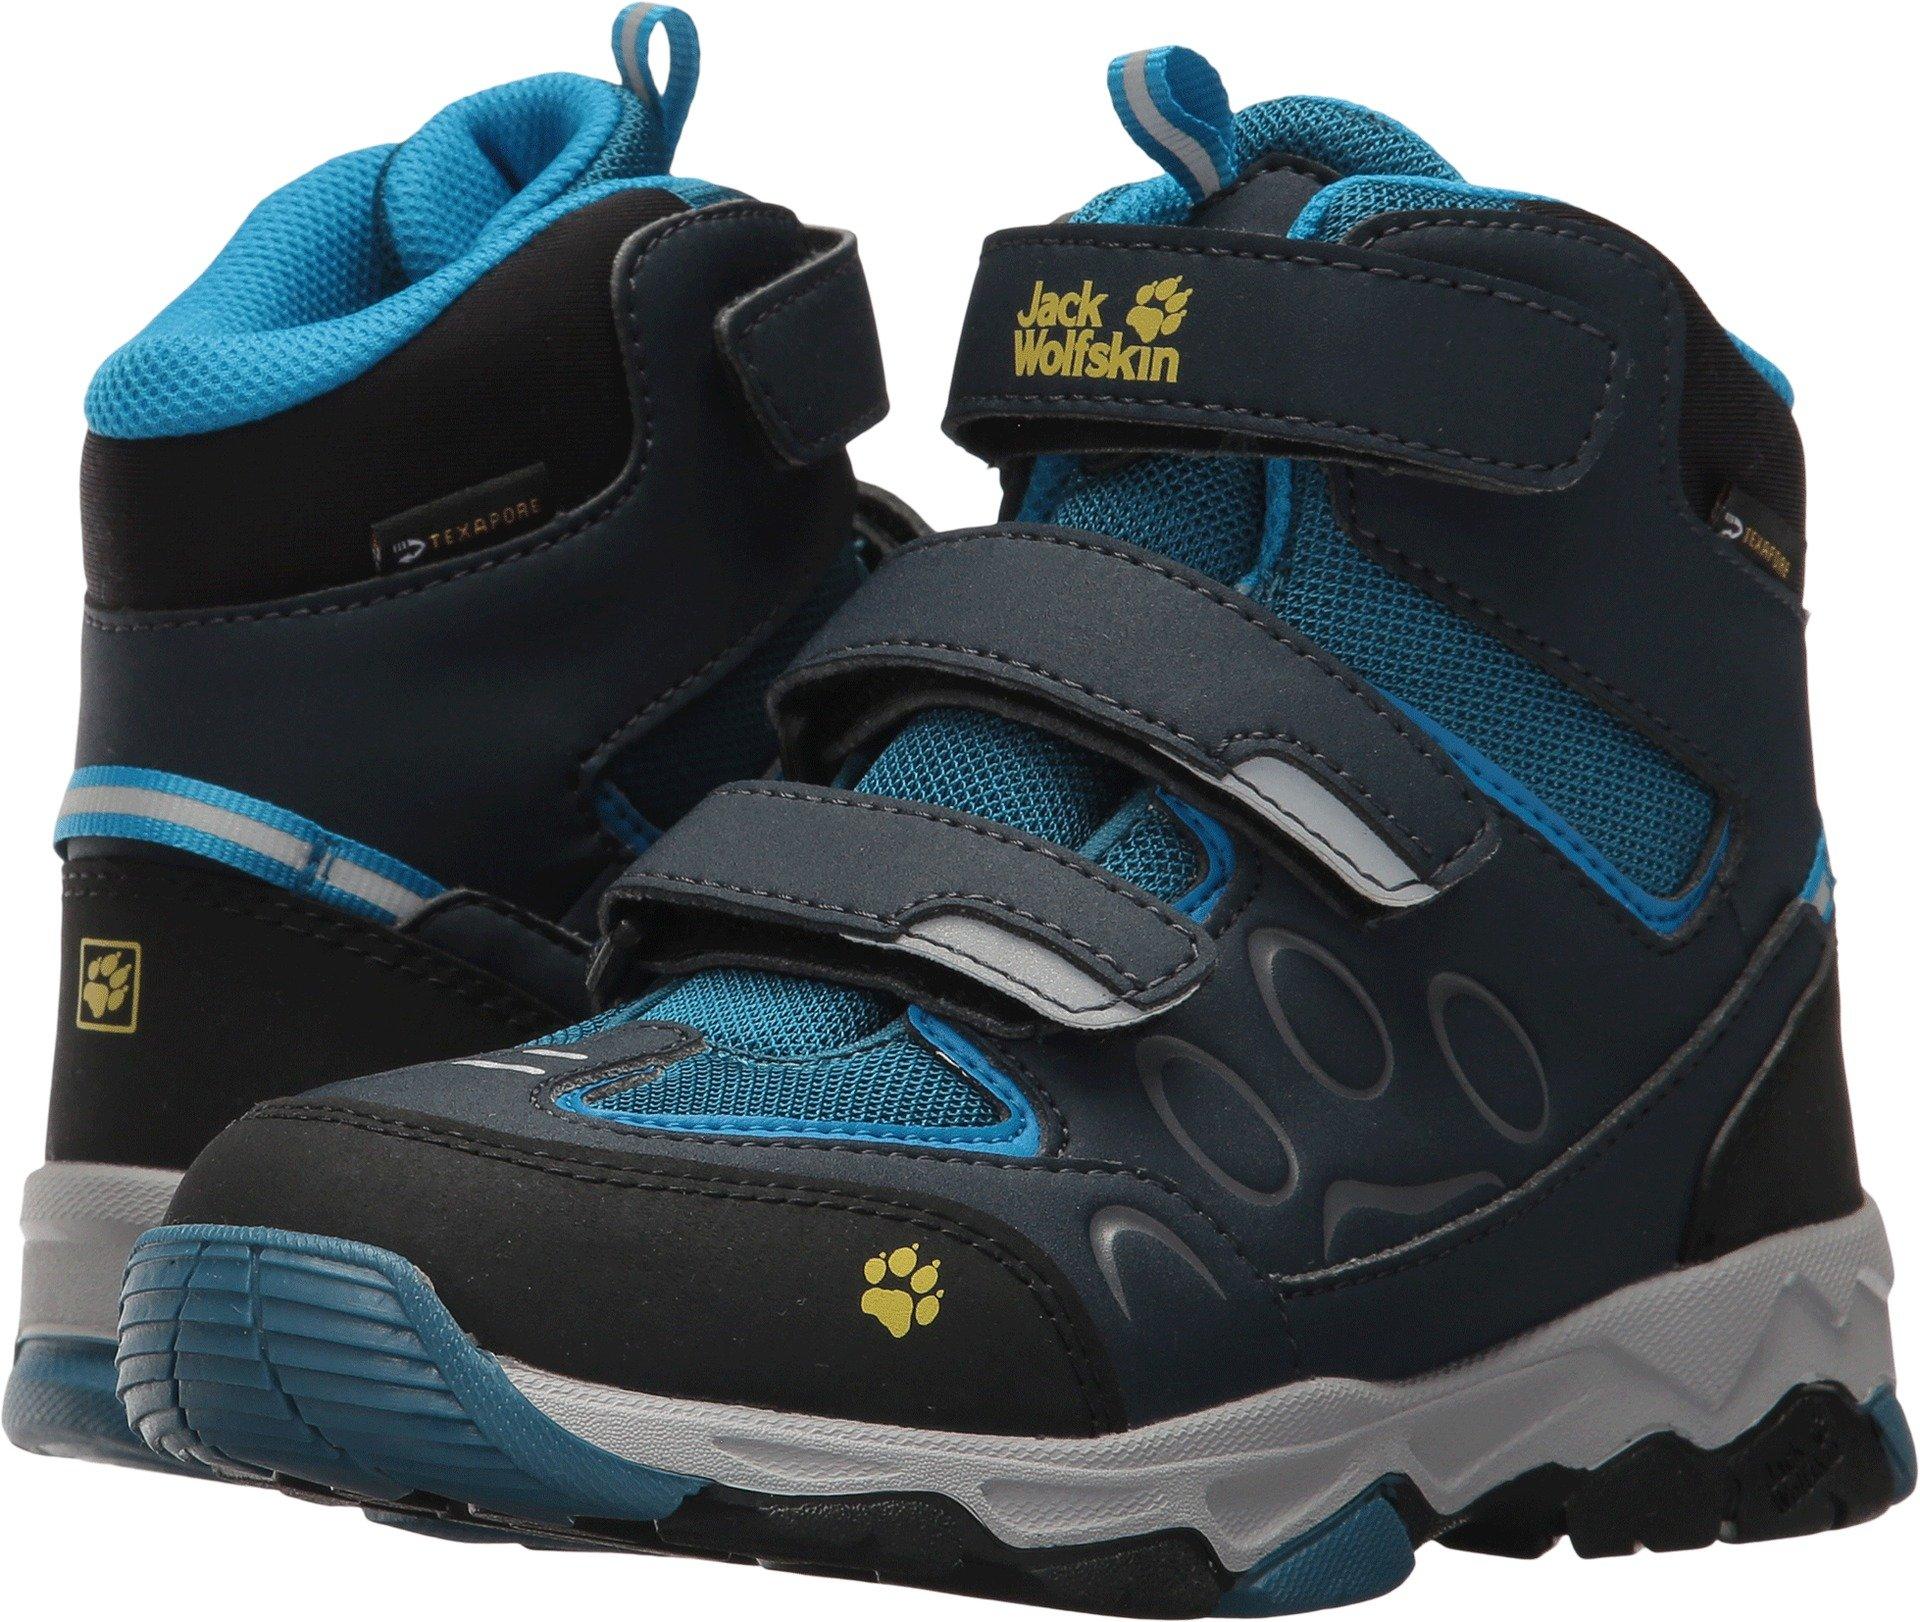 Jack Wolfskin Unisex-Kids MTN Attack 2 Texapore Mid VC K Hiking Boot, Glacier Blue, 1 M US Little Kid